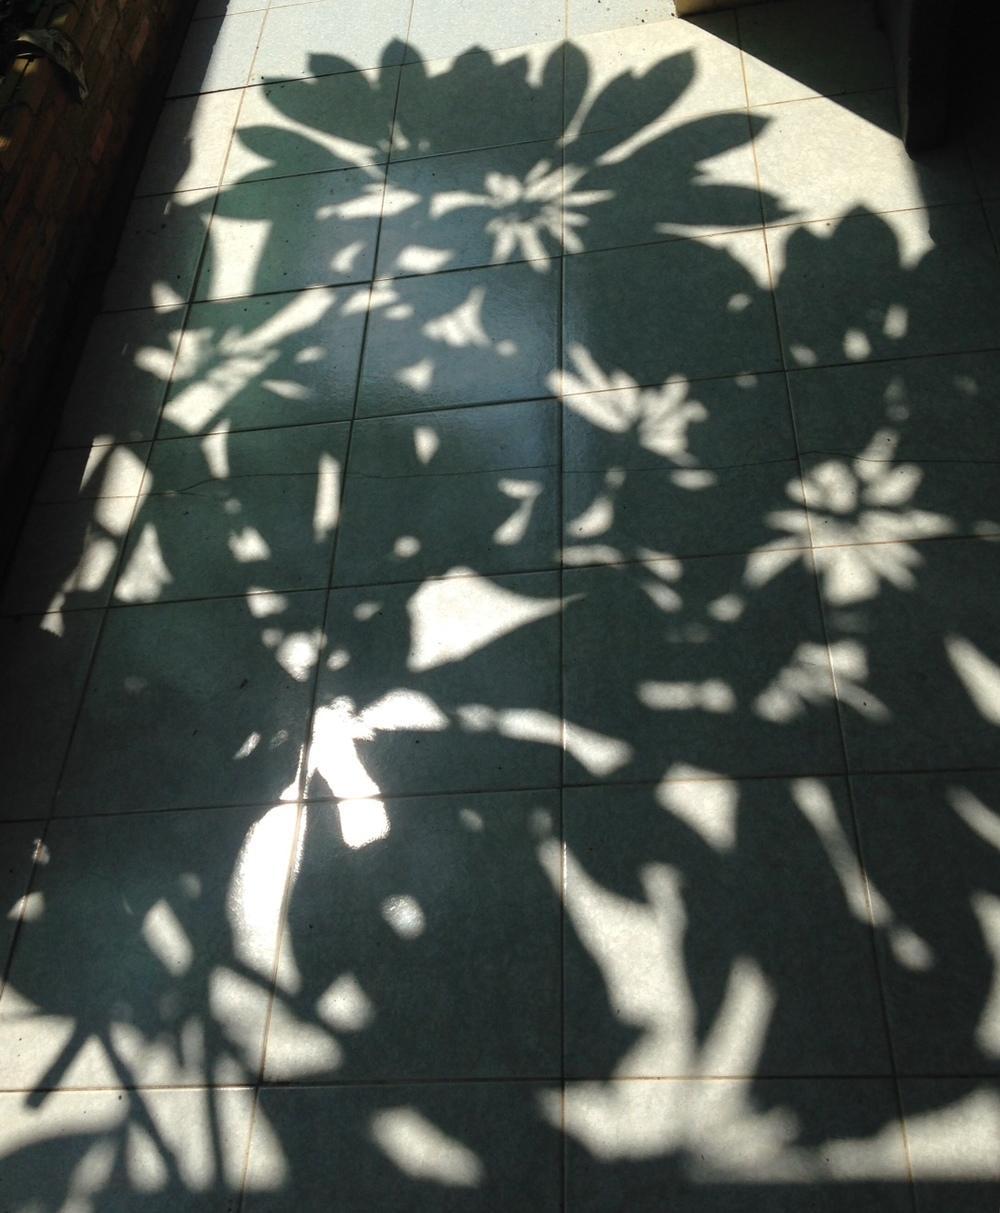 Shadows on the Floor, Ban Samrit